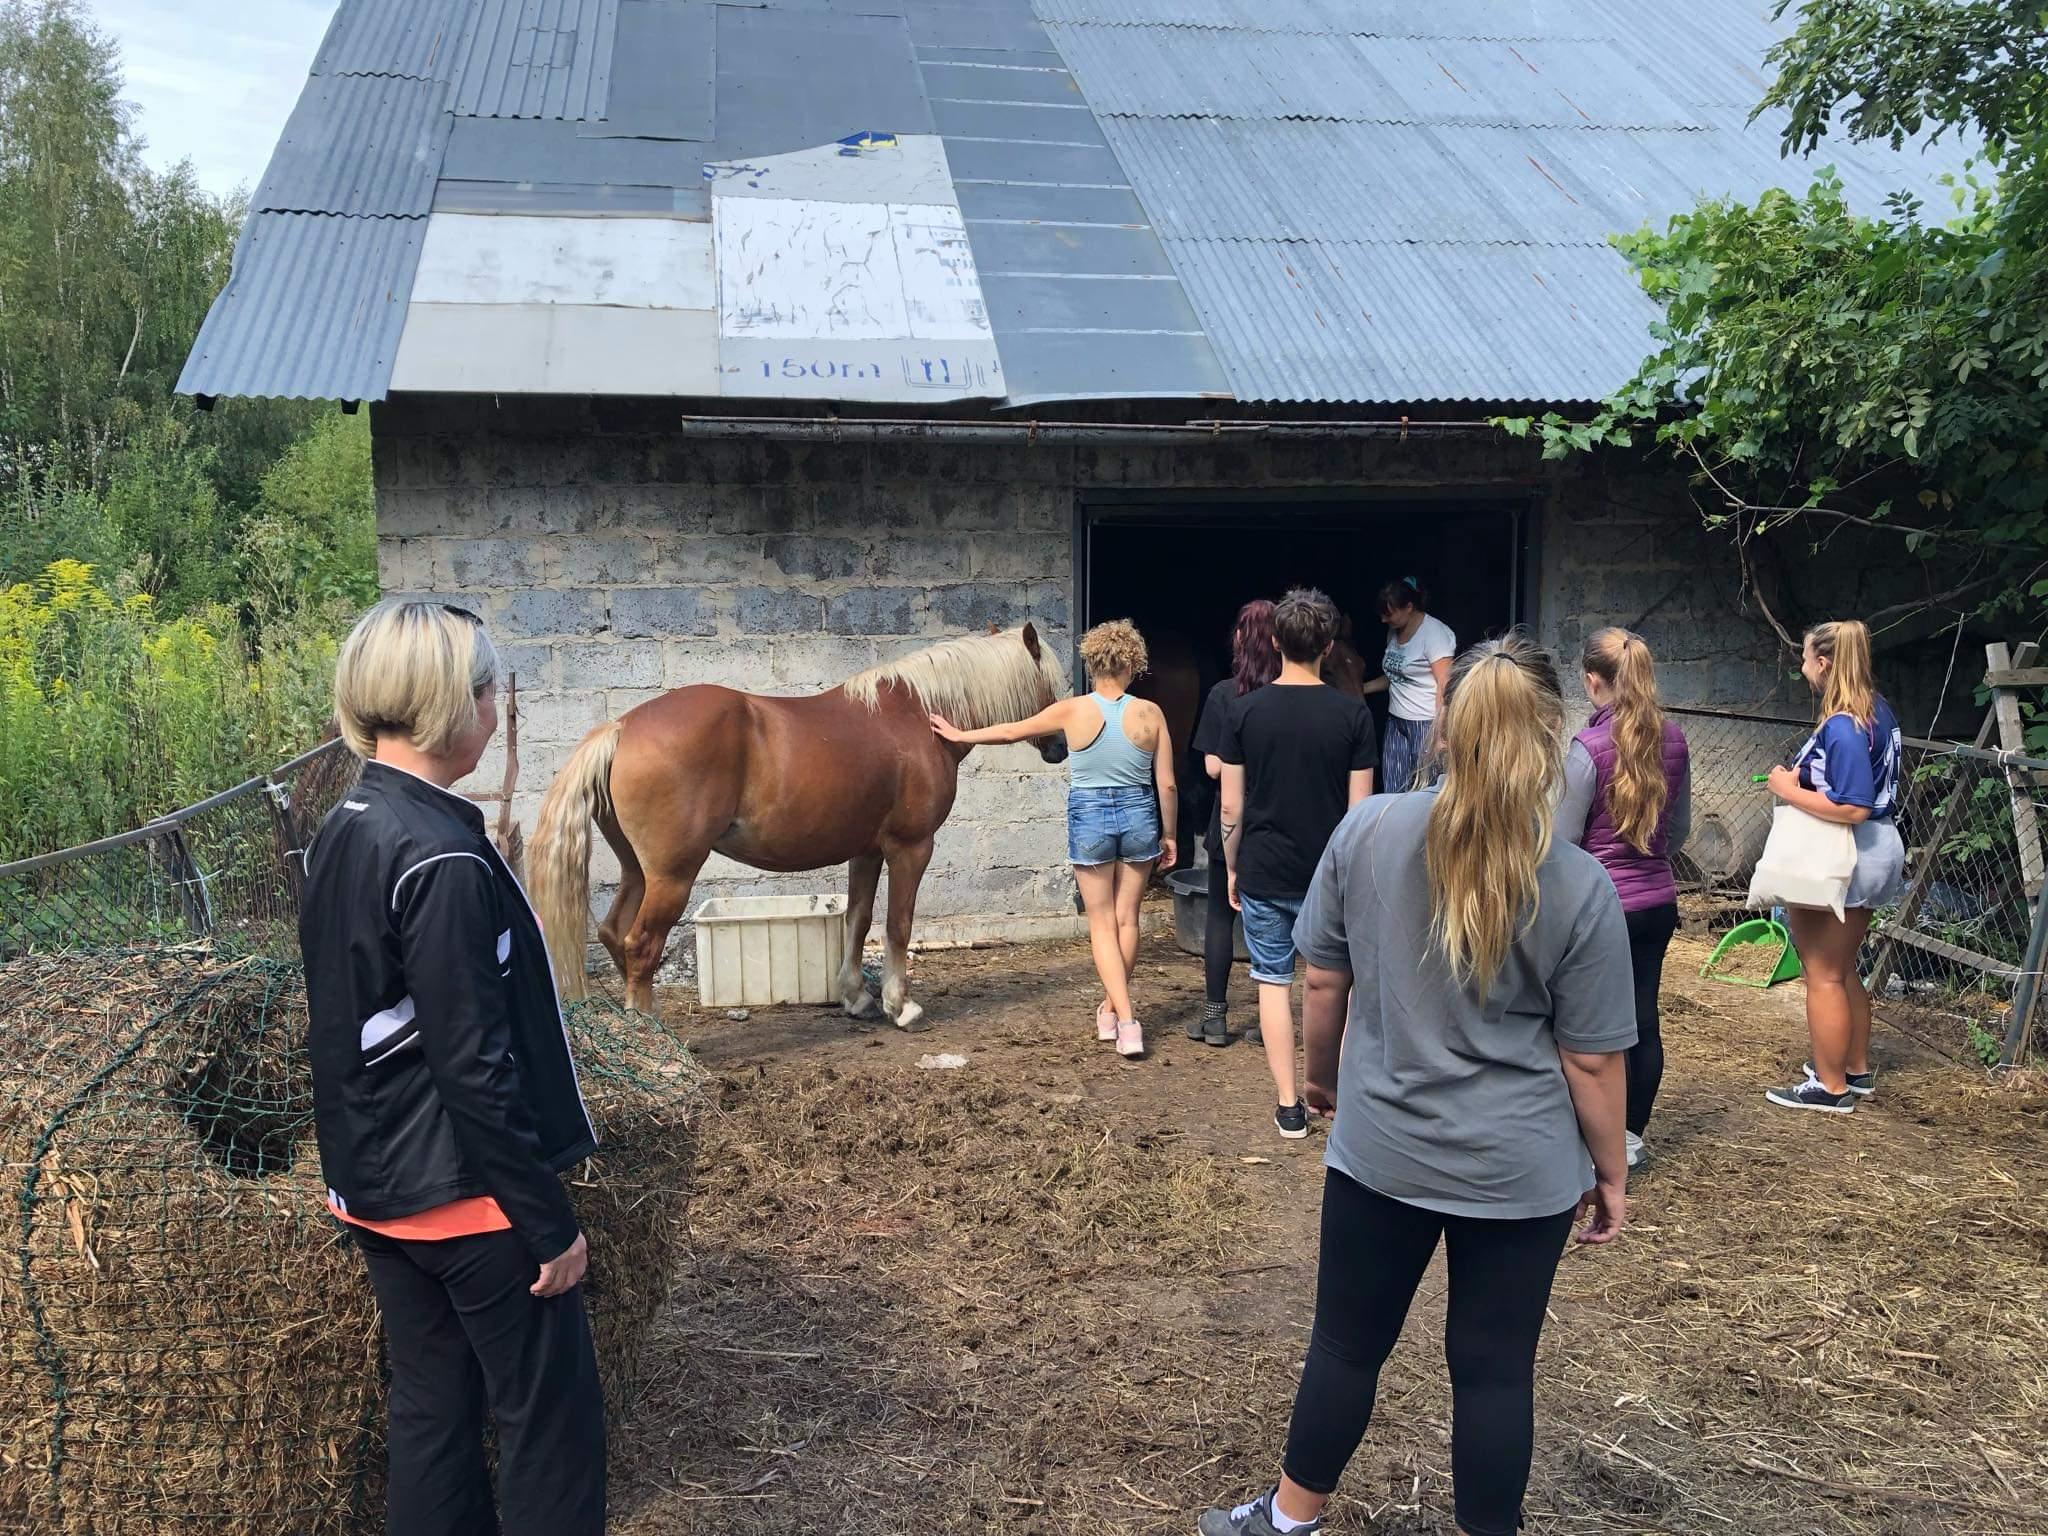 Stadnina koni w Sosnówce